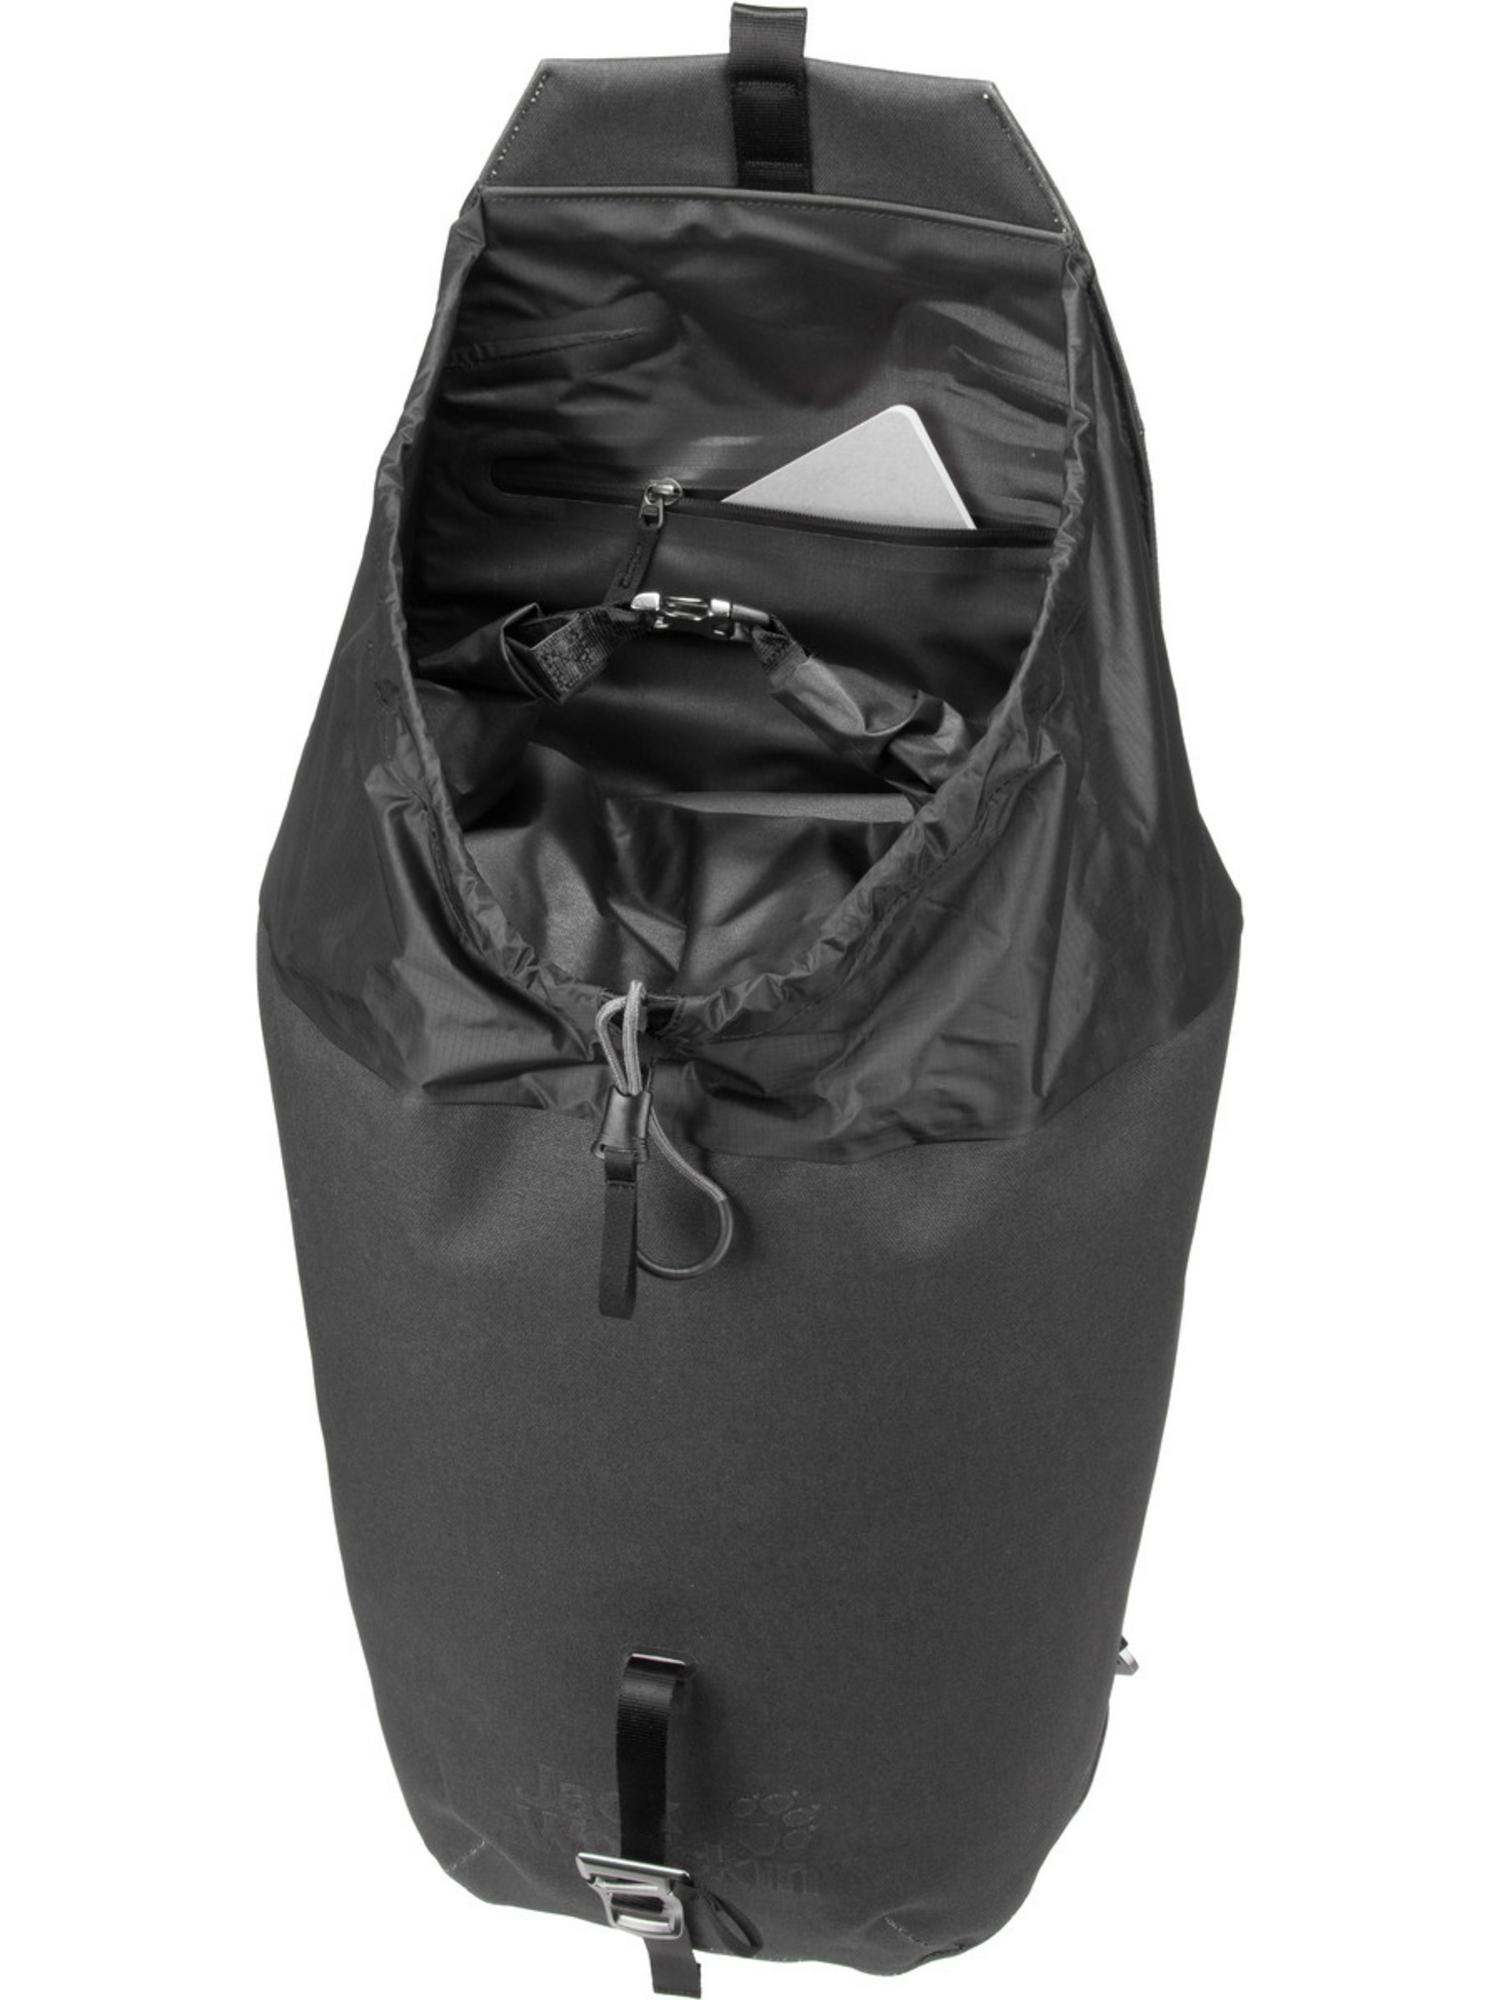 Jack Wolfskin Rucksack Daypack Boomer 30 Phantom (30 Liter